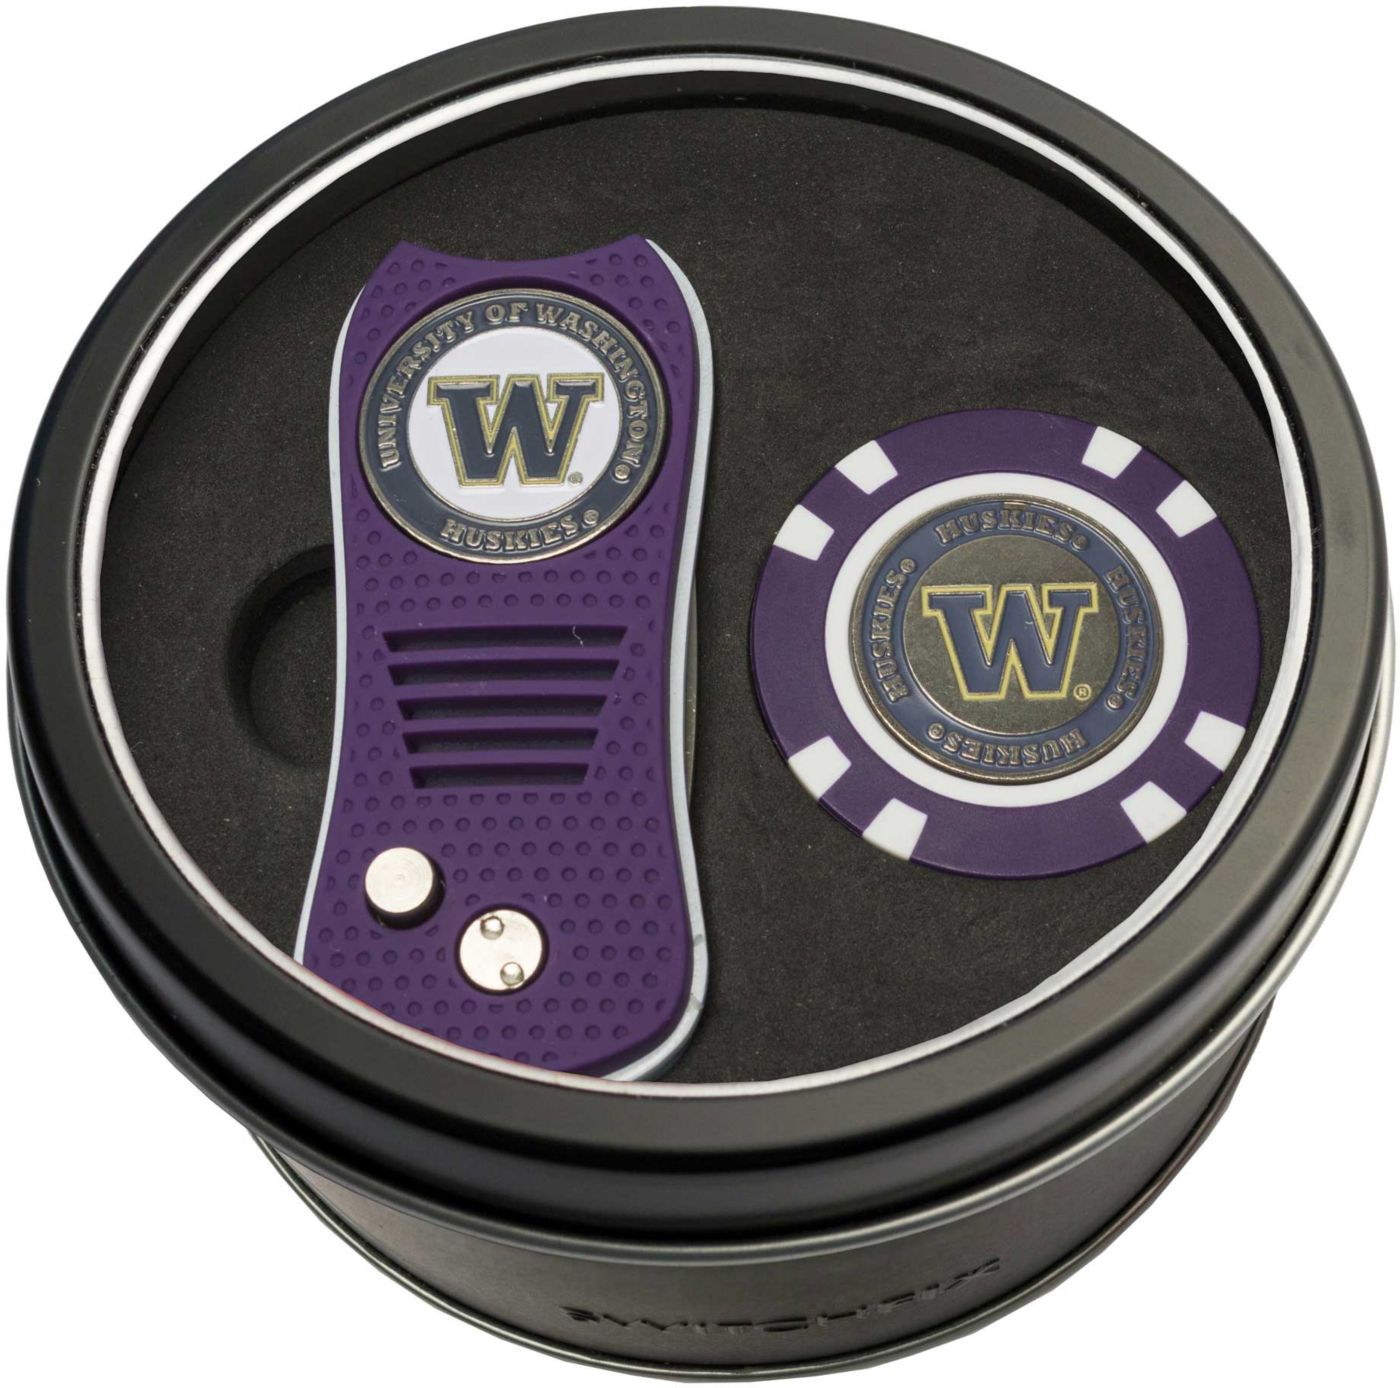 Team Golf Washington Huskies Switchfix Divot Tool and Poker Chip Ball Marker Set